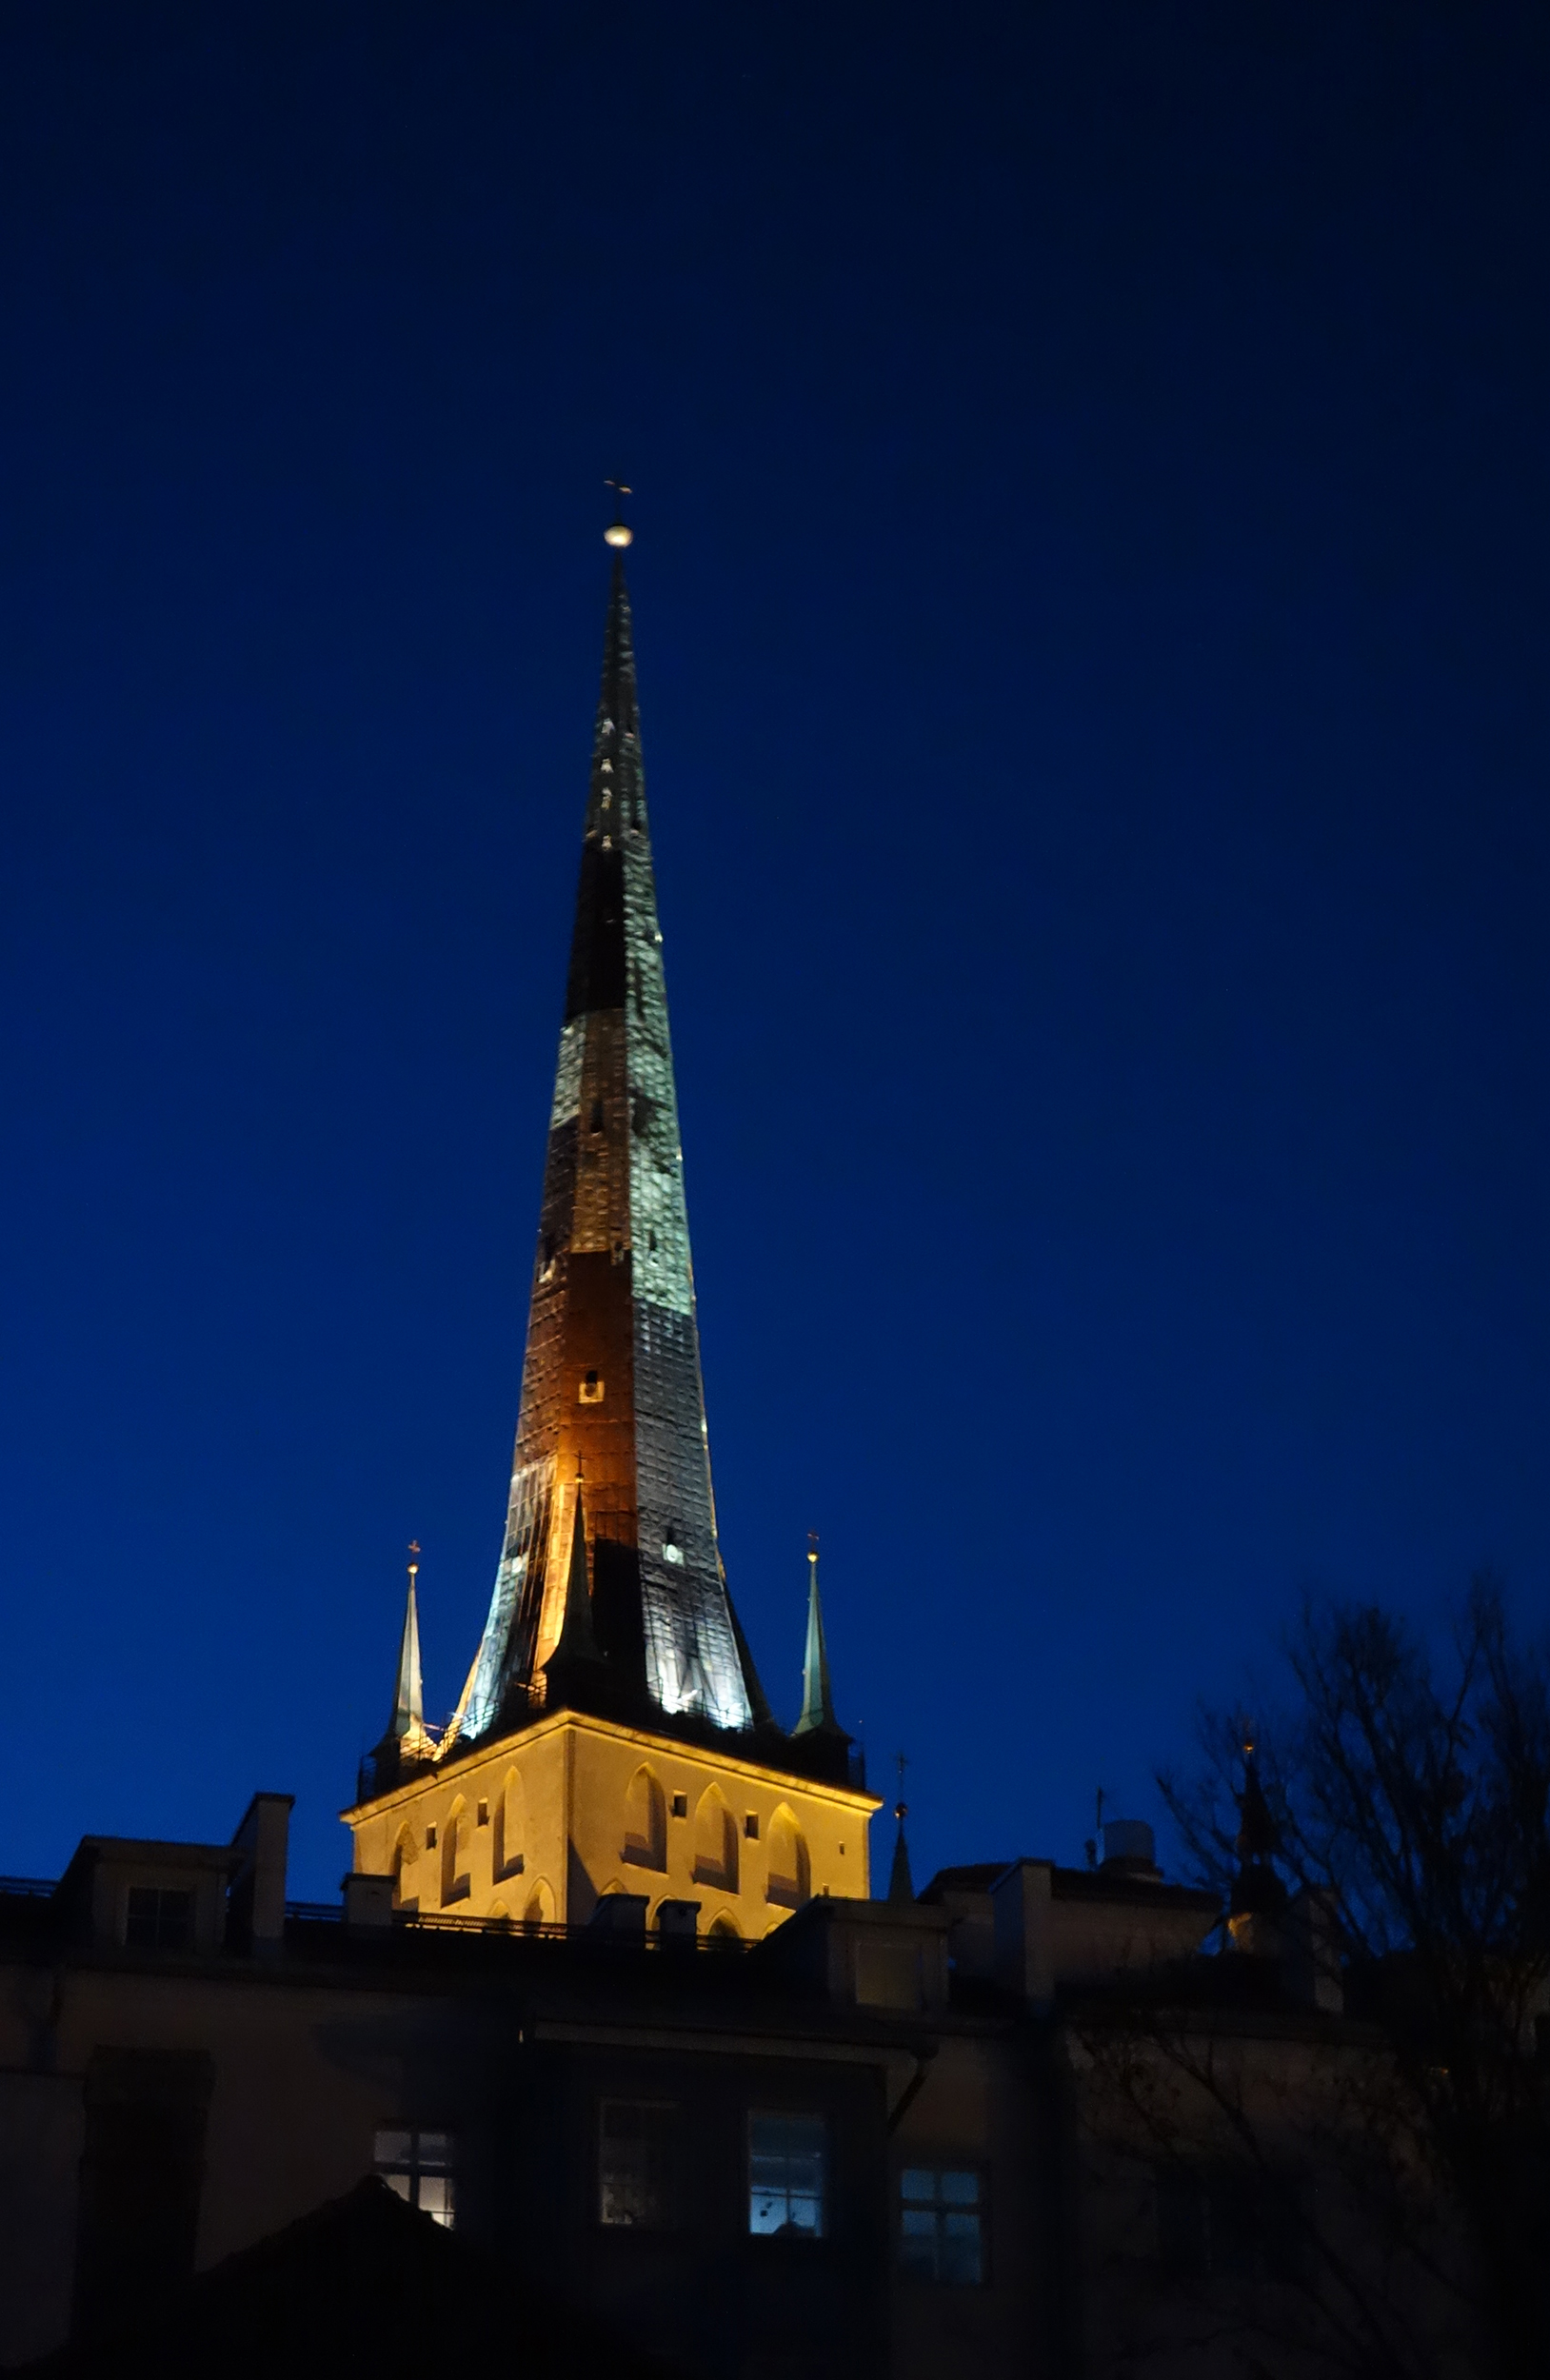 Tallinn cathedral